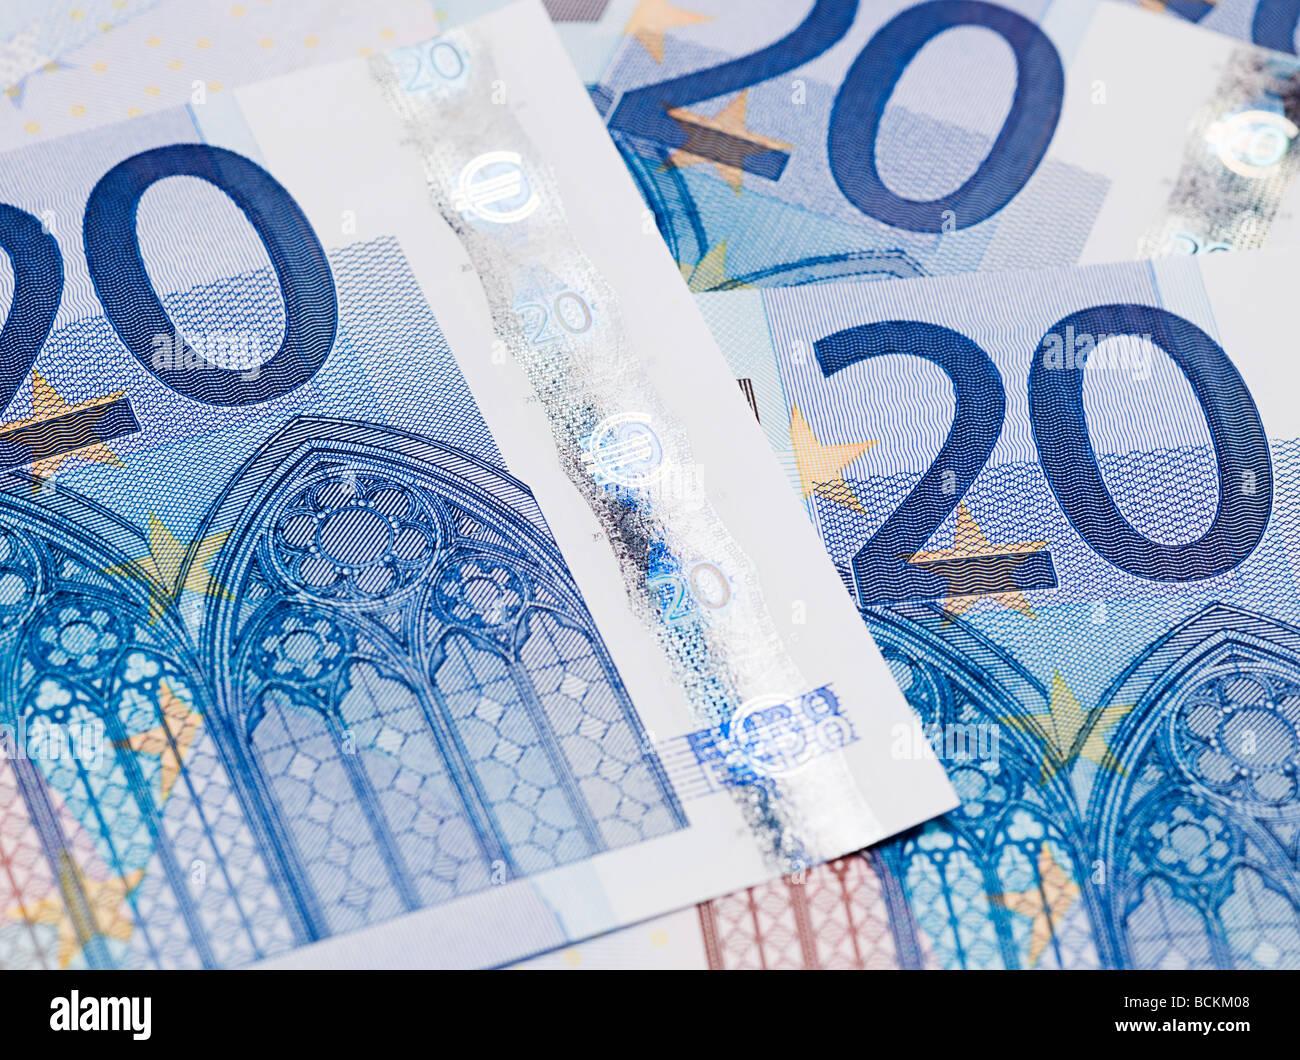 Twenty euro banknotes - Stock Image